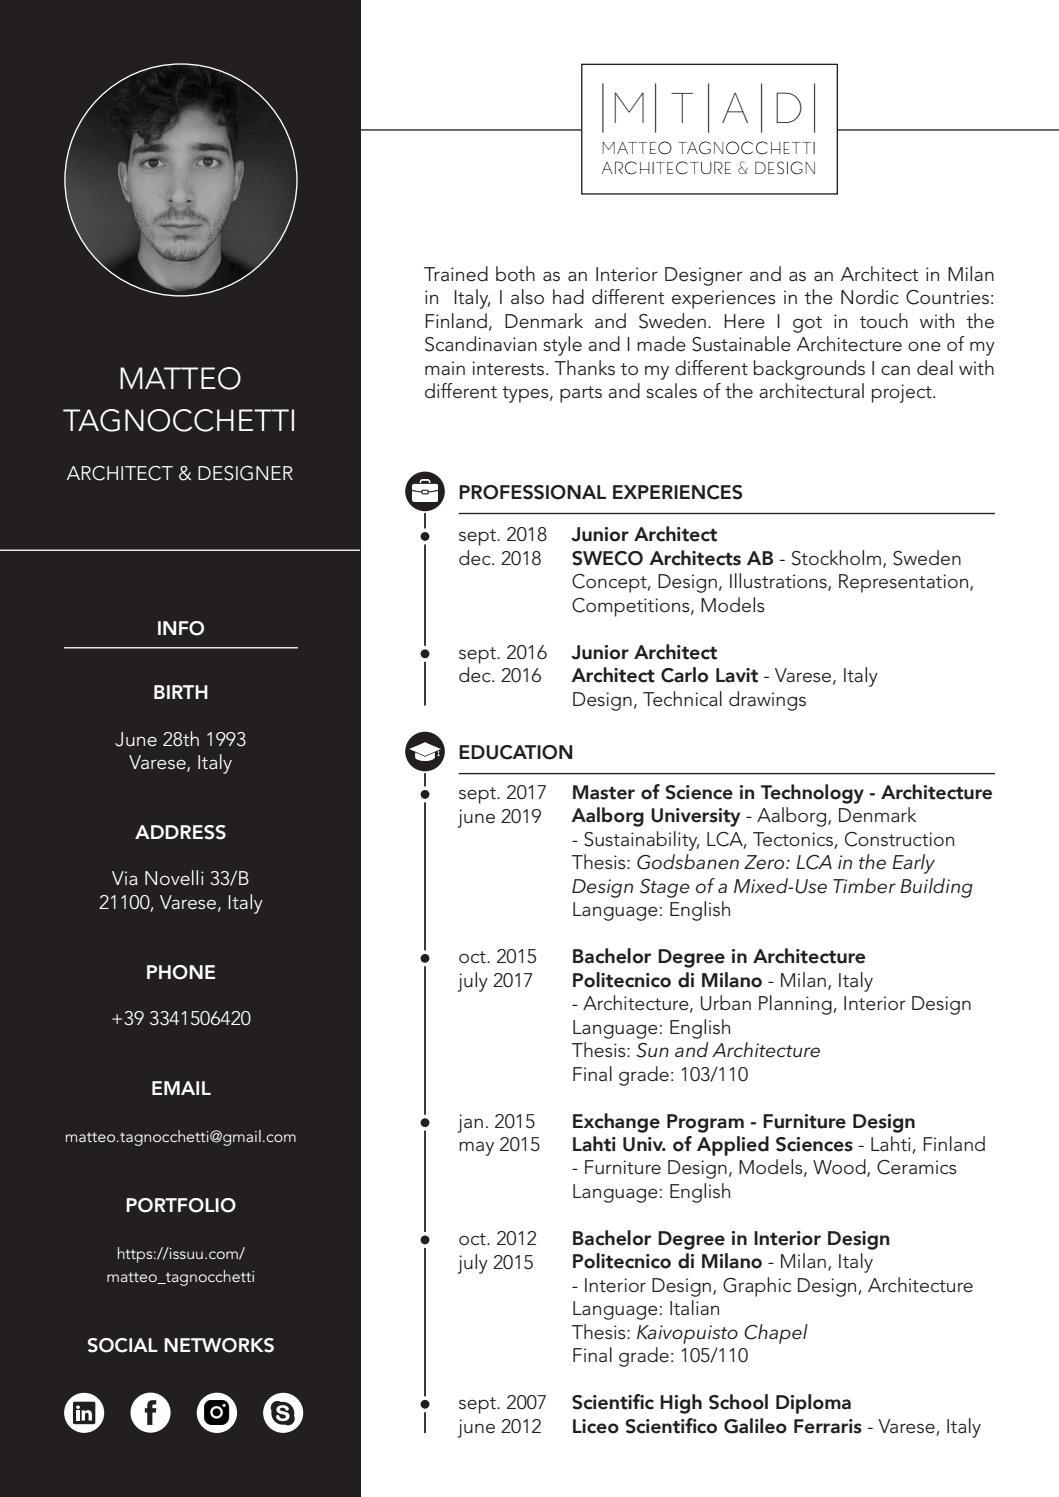 Cv Curriculum Vitae By Matteo Tagnocchetti Issuu